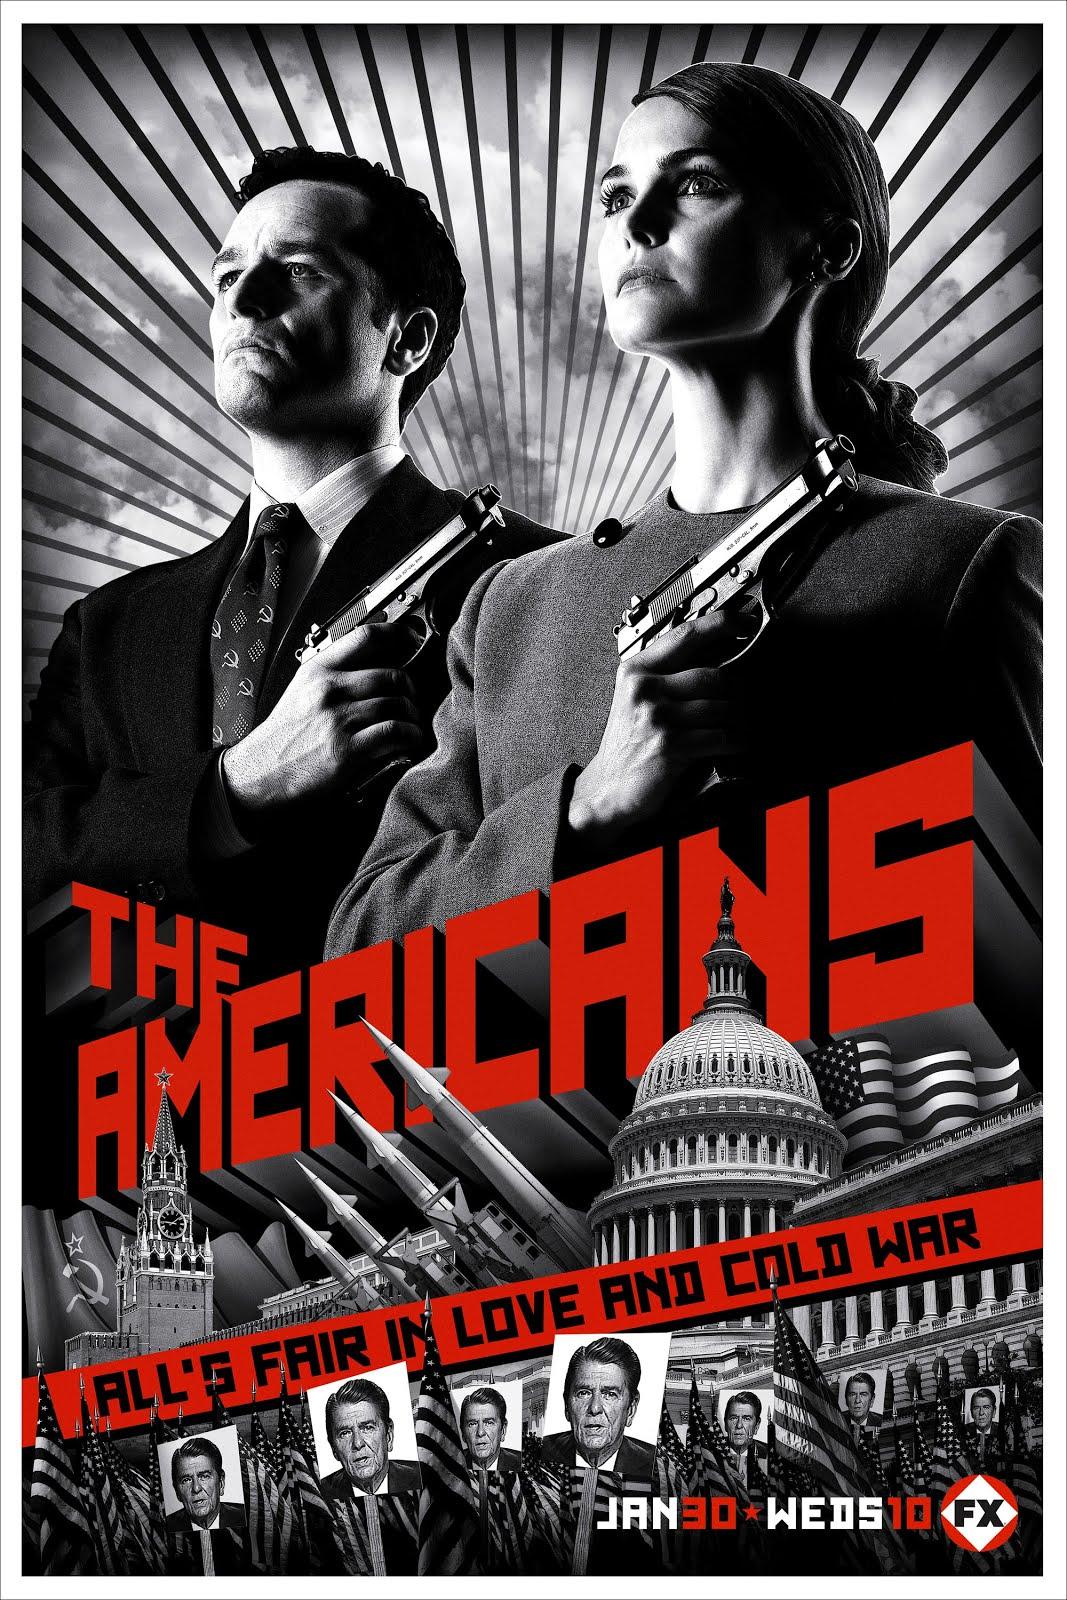 http://www.apaixonadosporseries.com.br/wp-content/arquivos/2013/01/The-americans-fx-poster.jpg